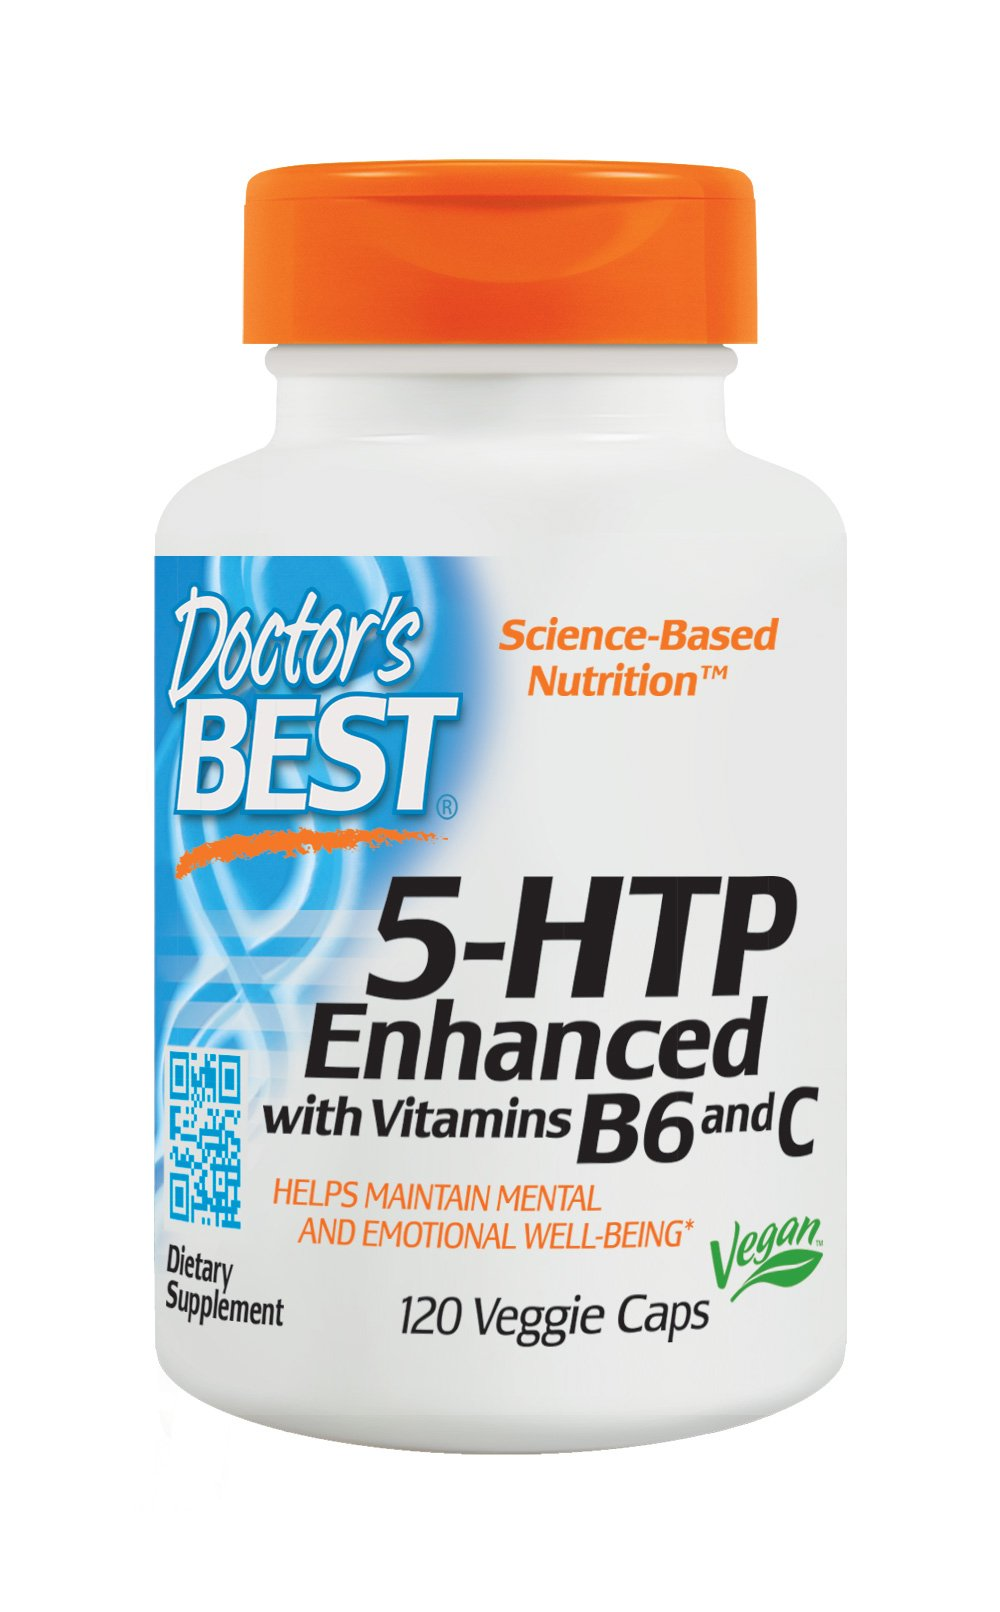 Doctor's Best 5-HTP Enhanced with Vitamins B6 and C, Non-GMO, Vegan, Gluten Free, Soy Free, 120 Veggie Caps